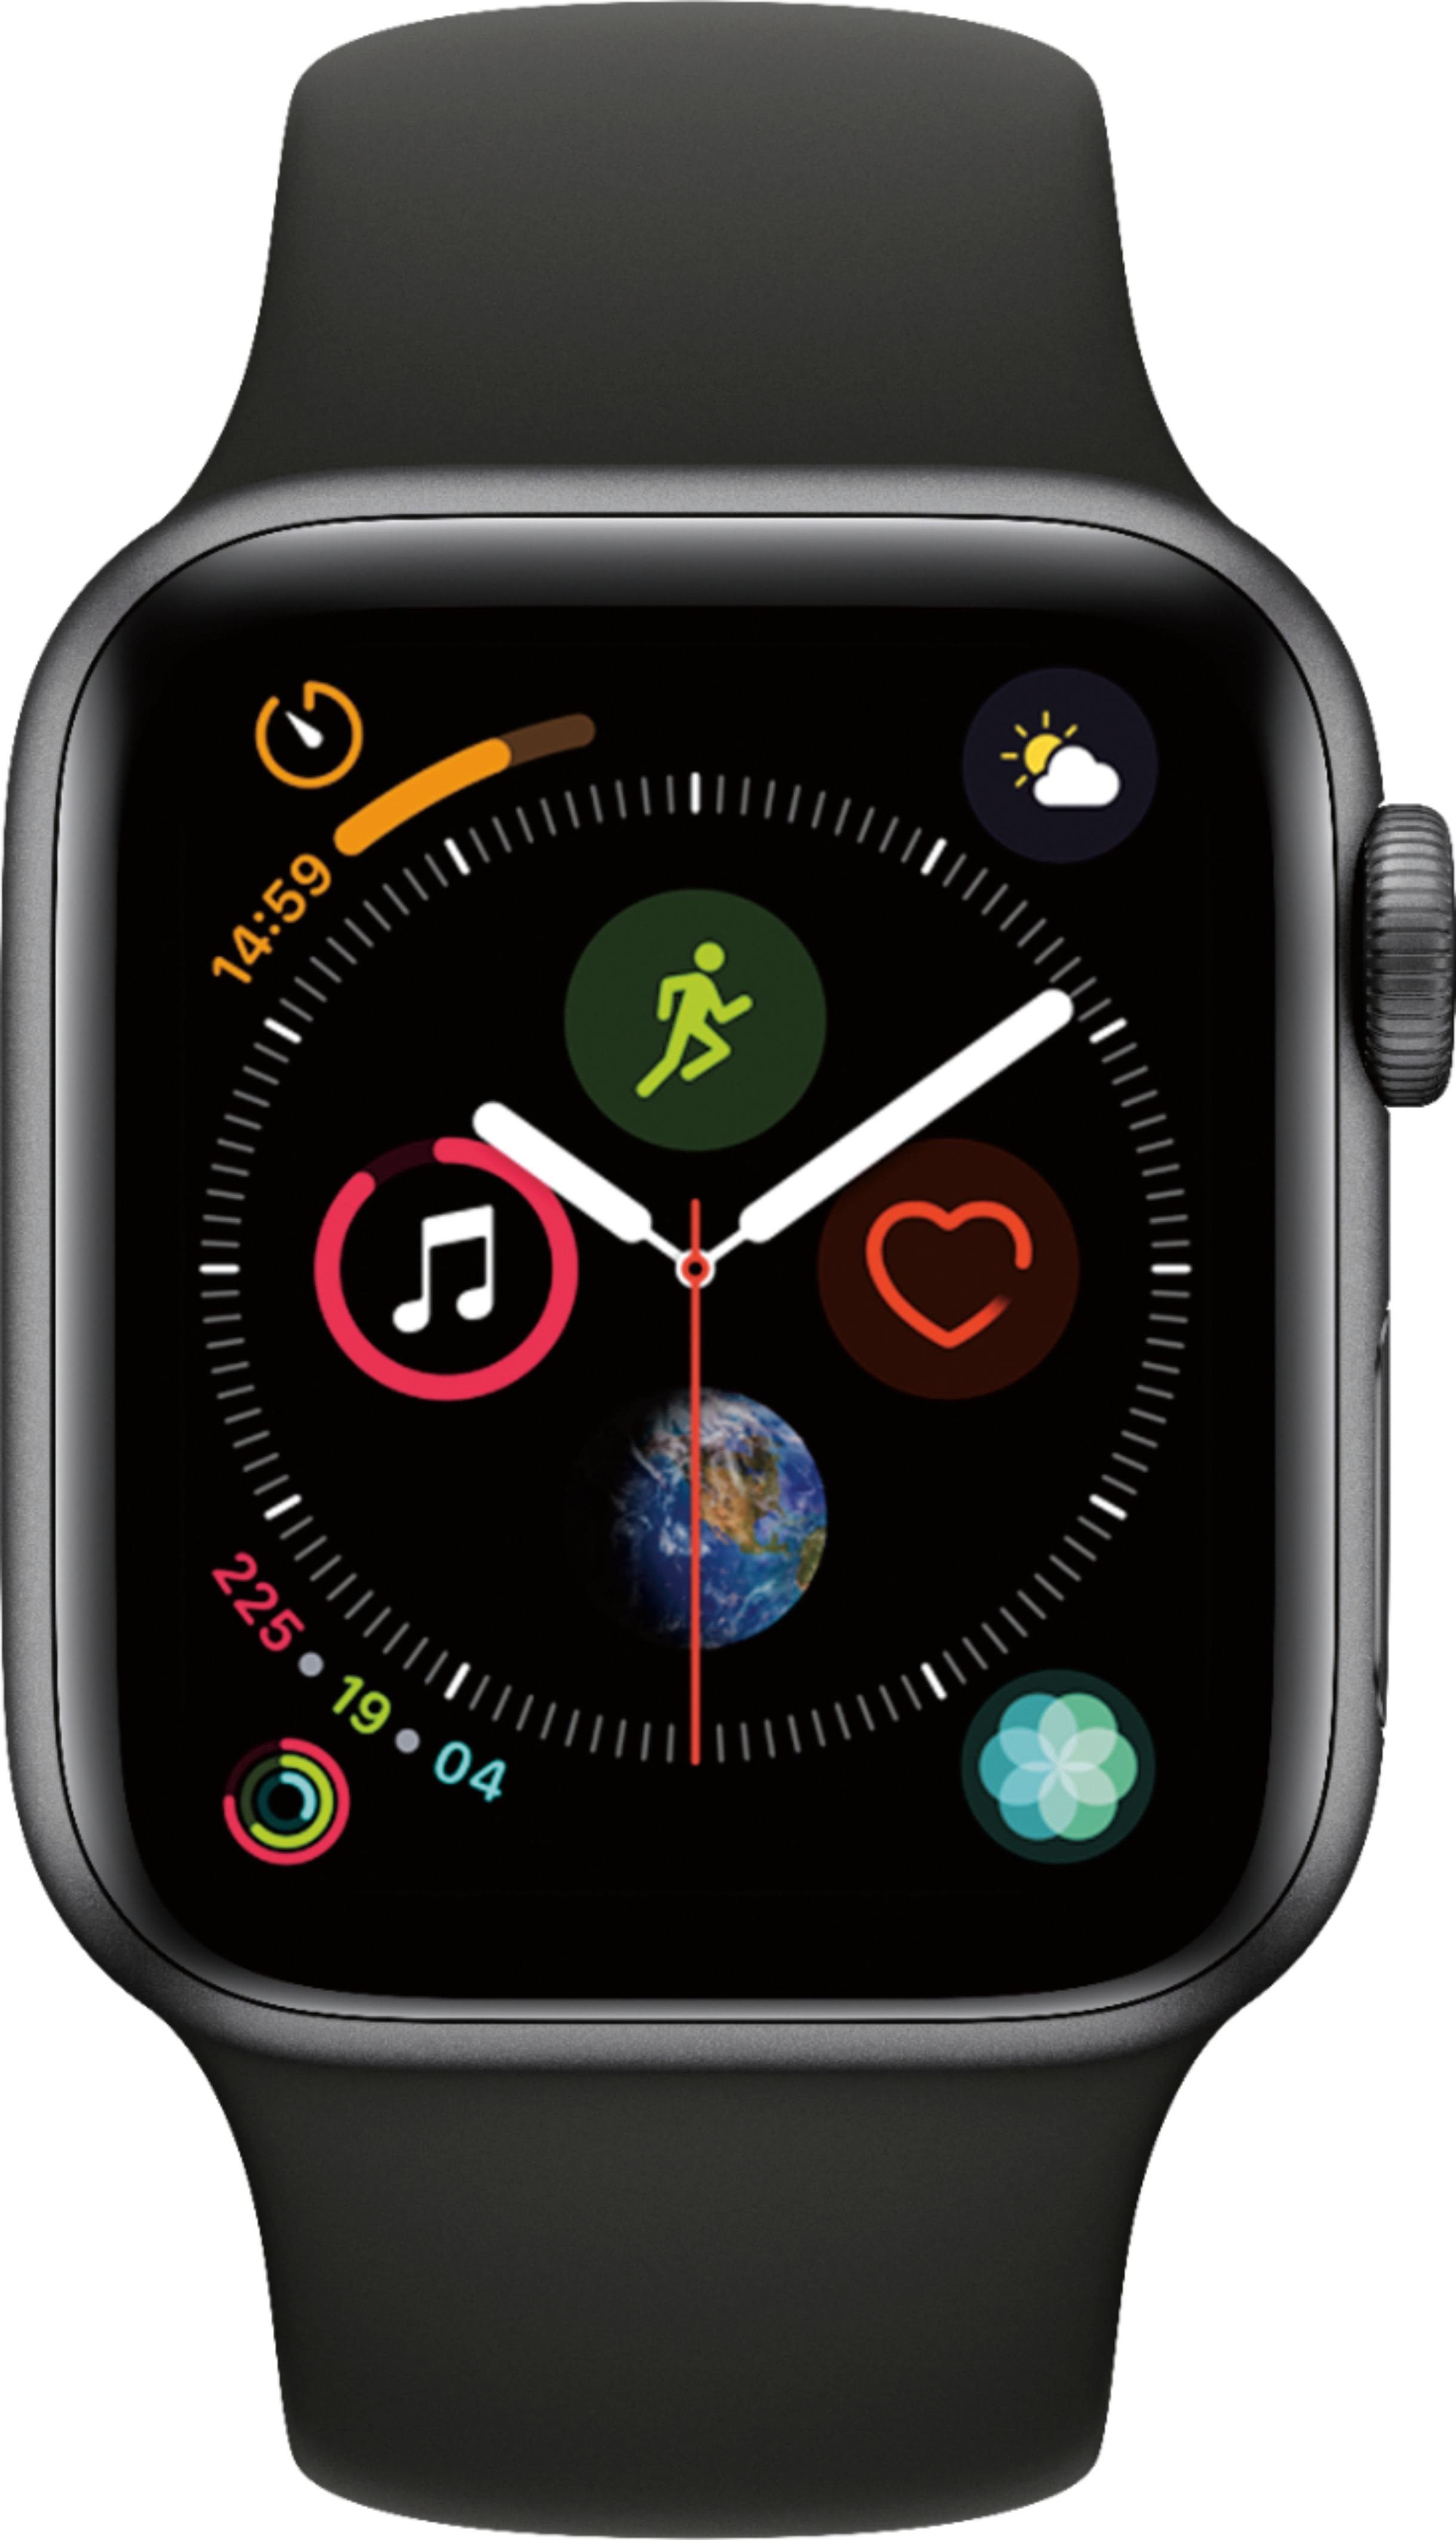 Apple Watch Series 4 (GPS) 40mm - $244.99 & 44mm - $265.99